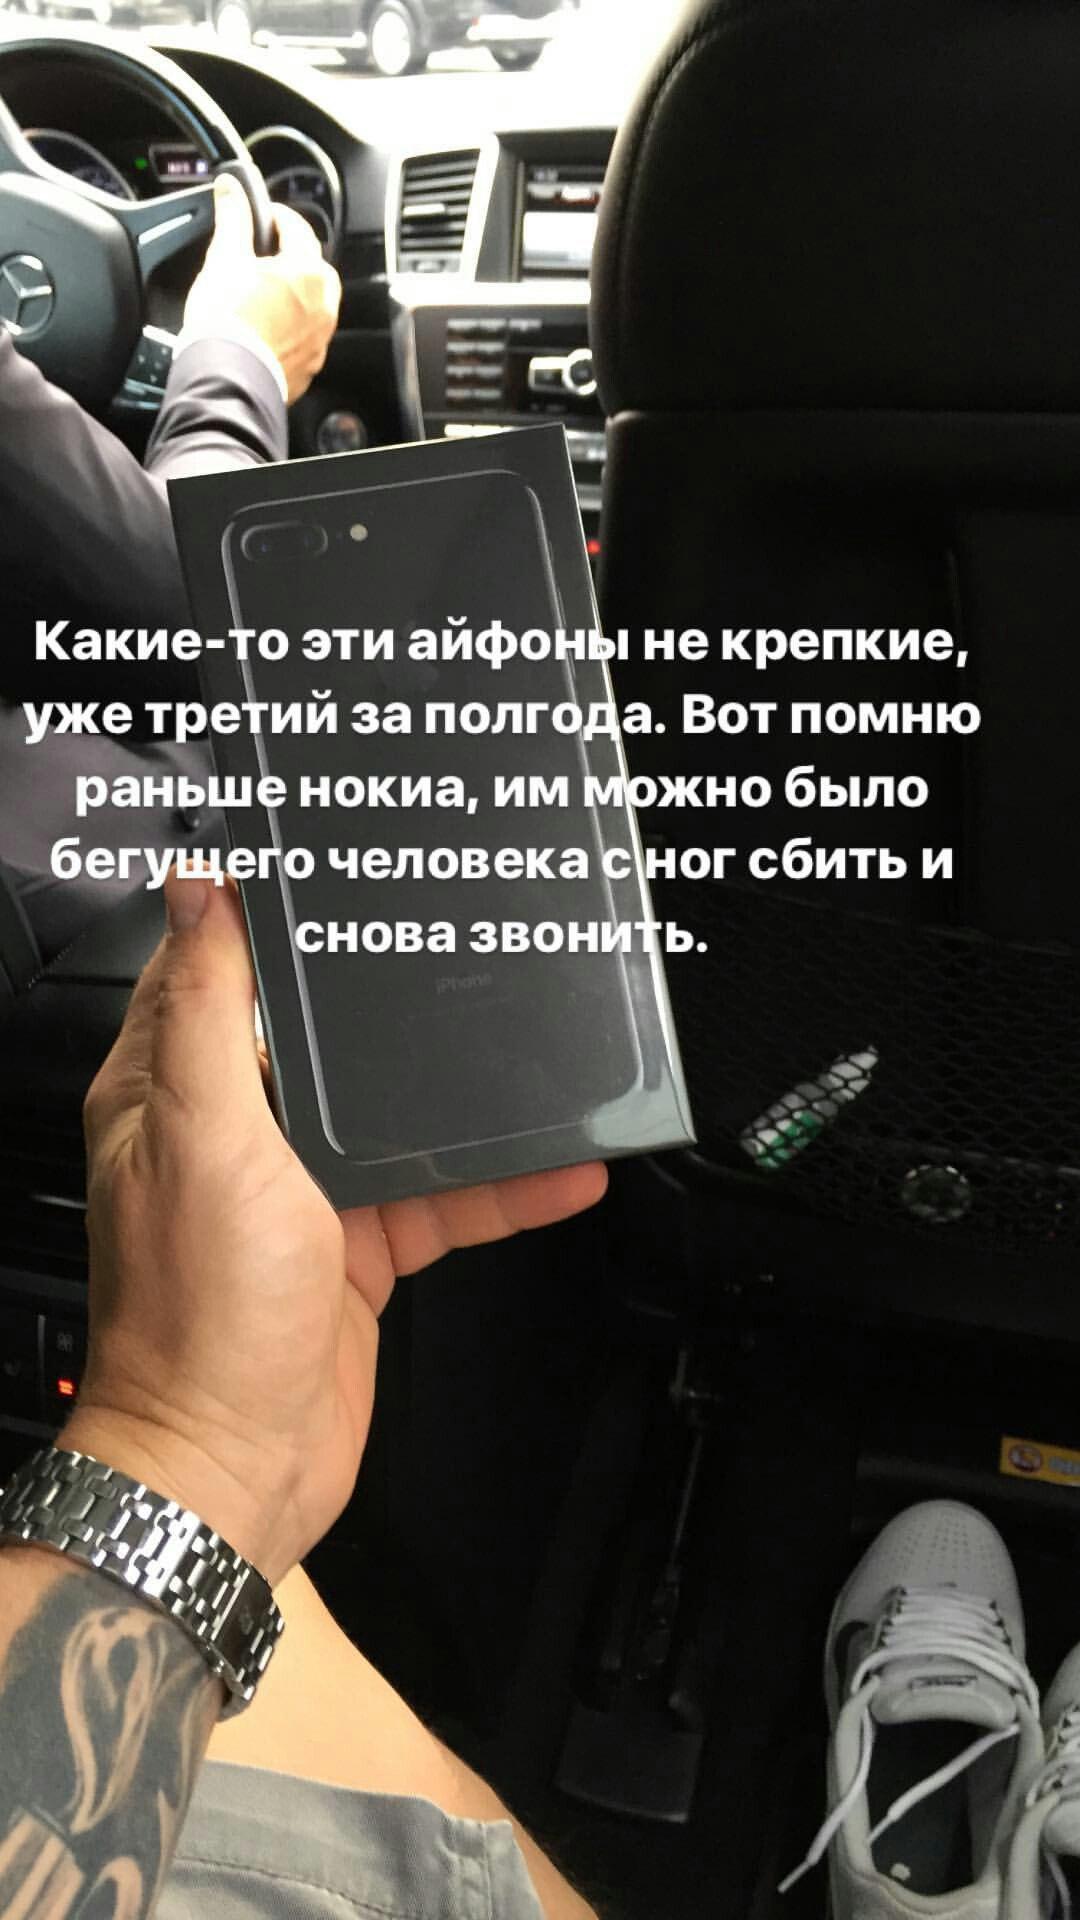 https://pp.userapi.com/c637422/v637422540/63018/axgMv_tH5WE.jpg